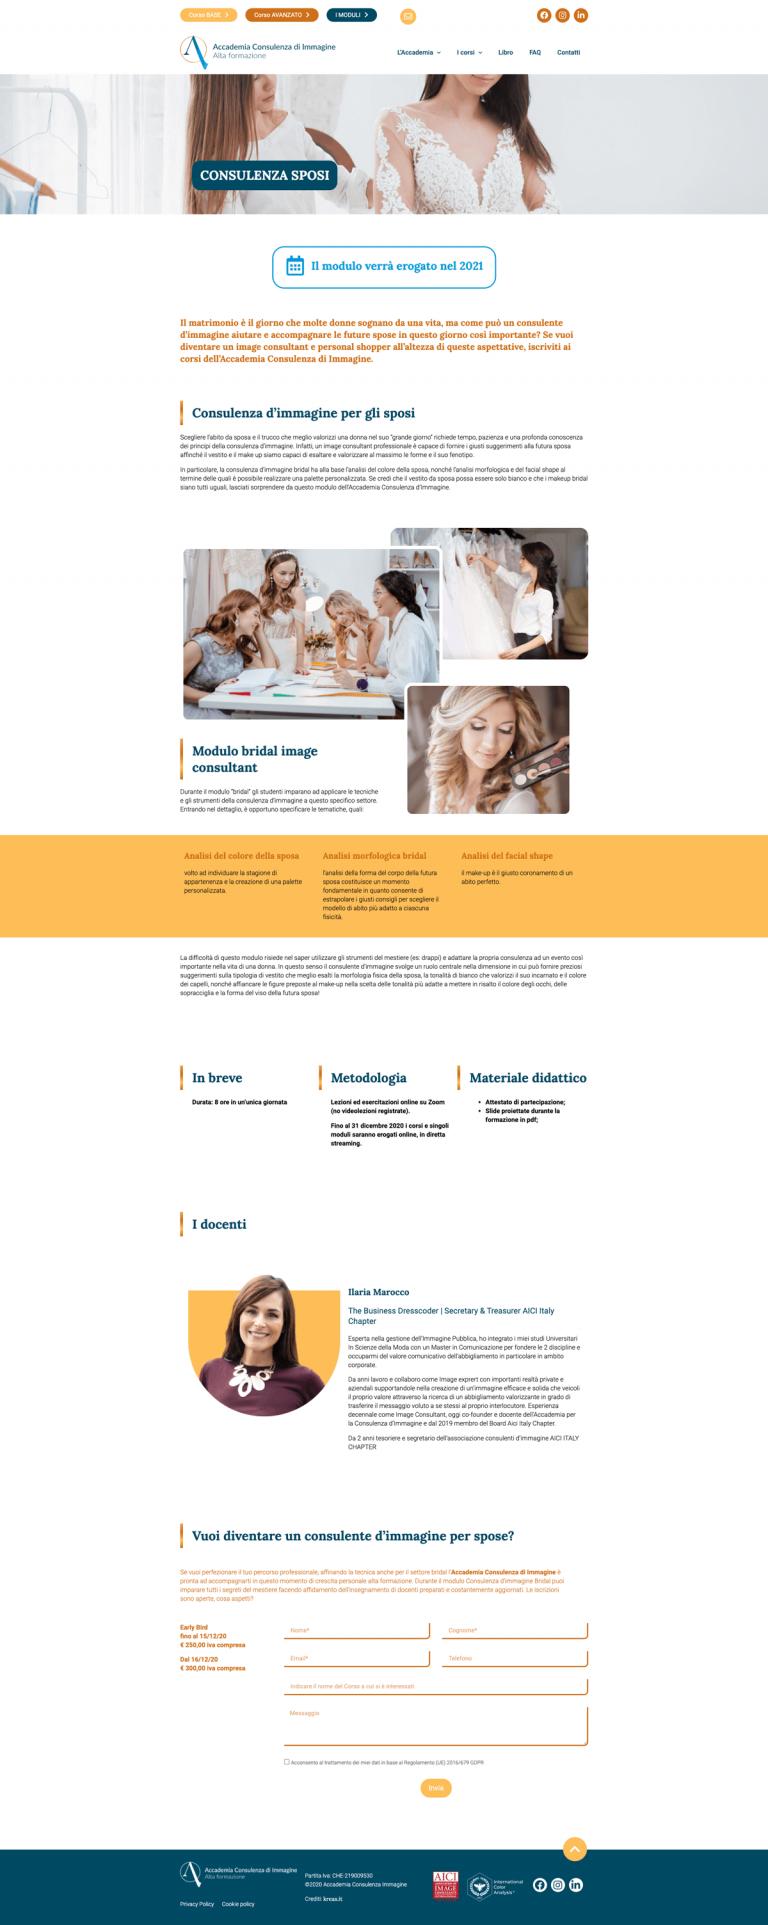 Kreas website accademiaconsulenzaimmagine i corsi moduli consulenza sposi